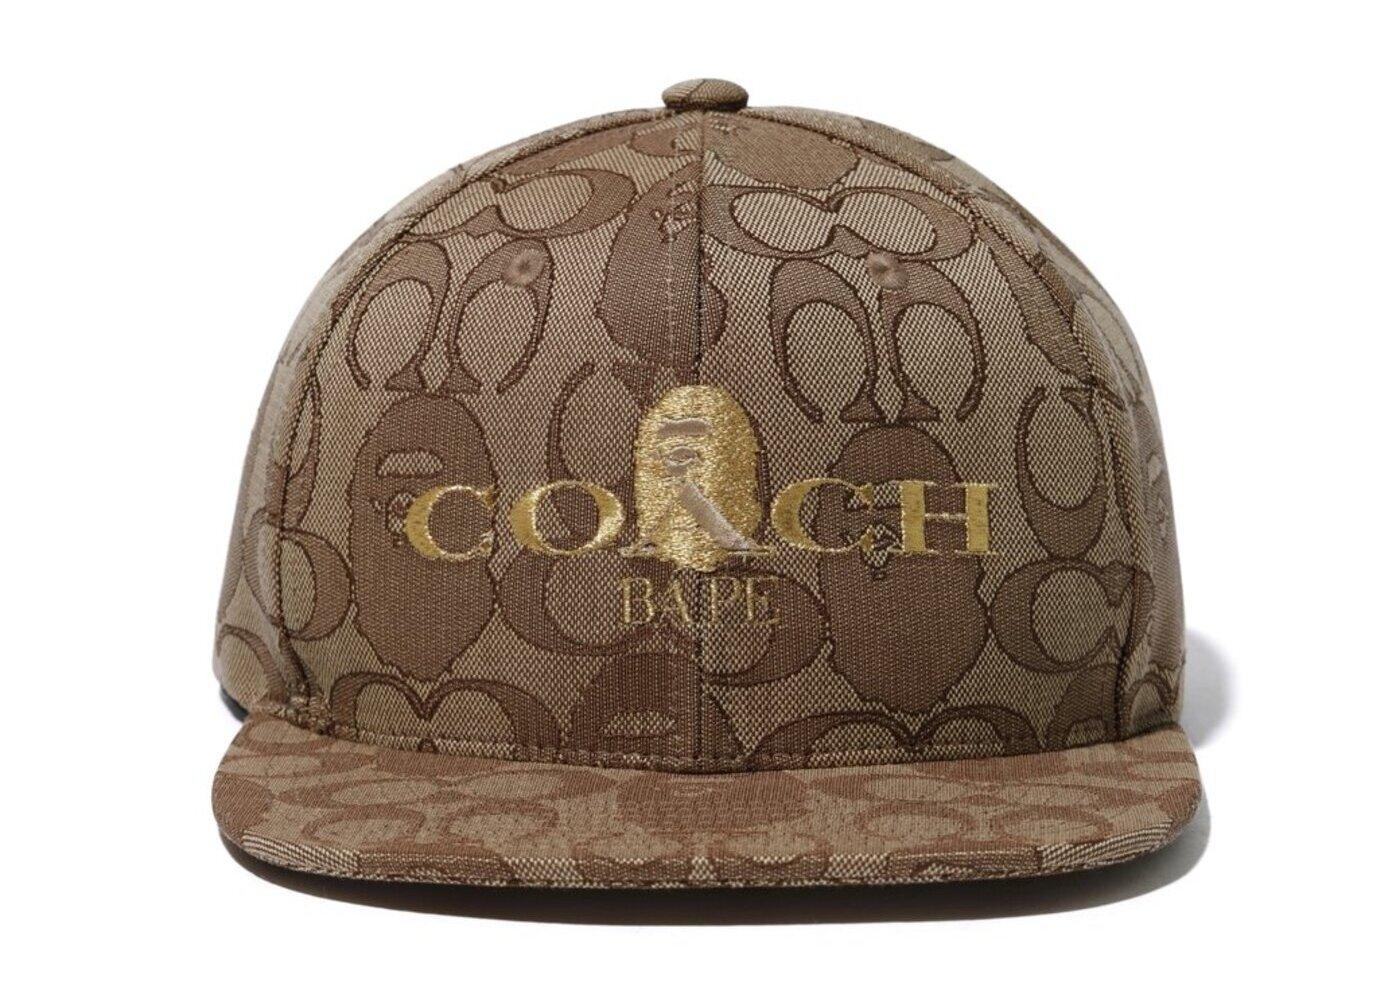 Bape x Coach Jacquard Baseball Cap Beige (SS20)の写真